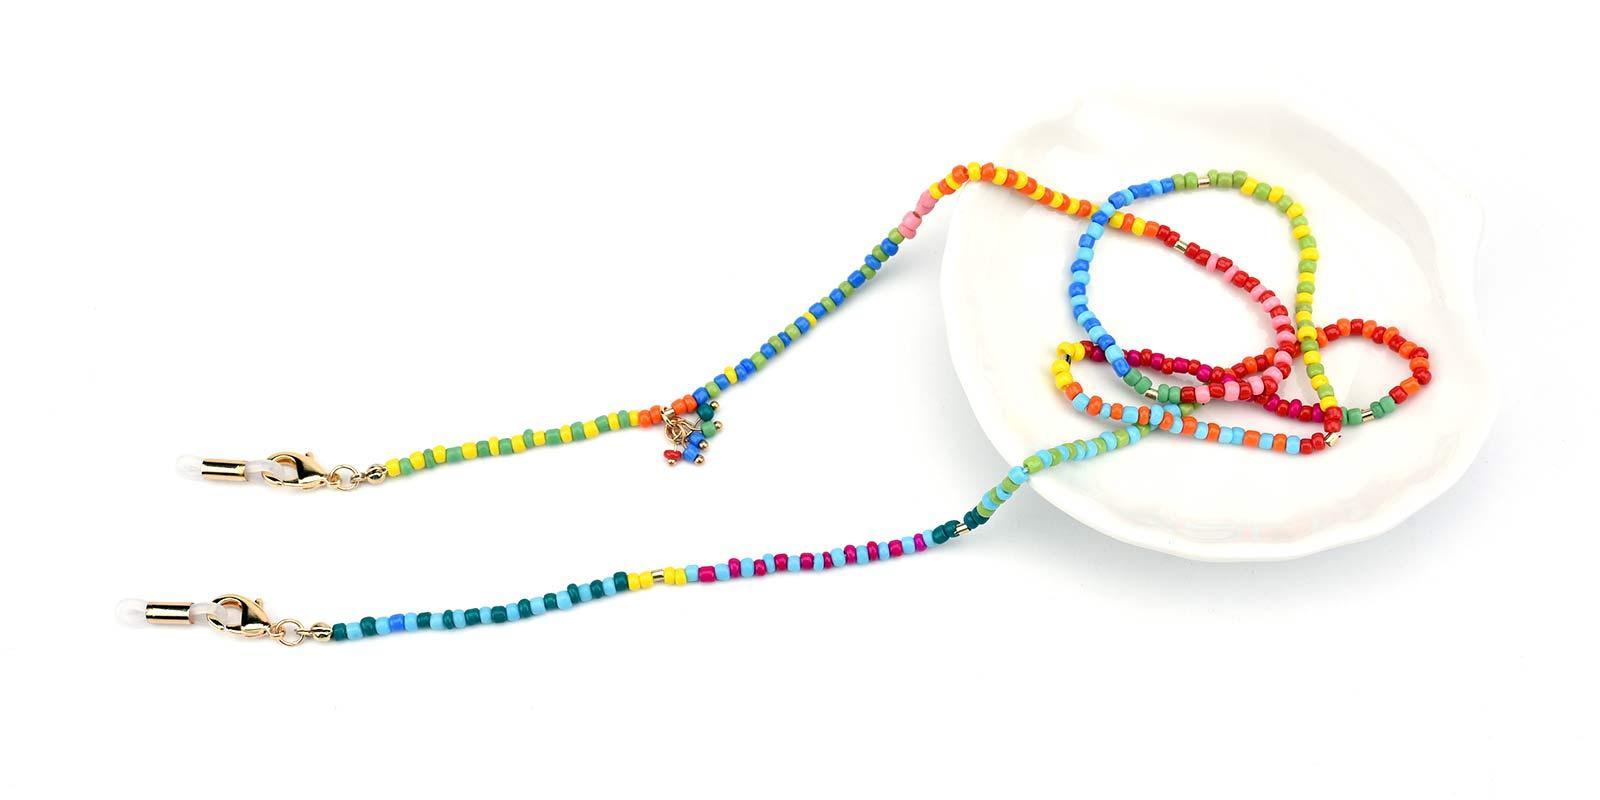 Glasses Chain10060-Multicolor--Plastic-Eyeglasses-additional3